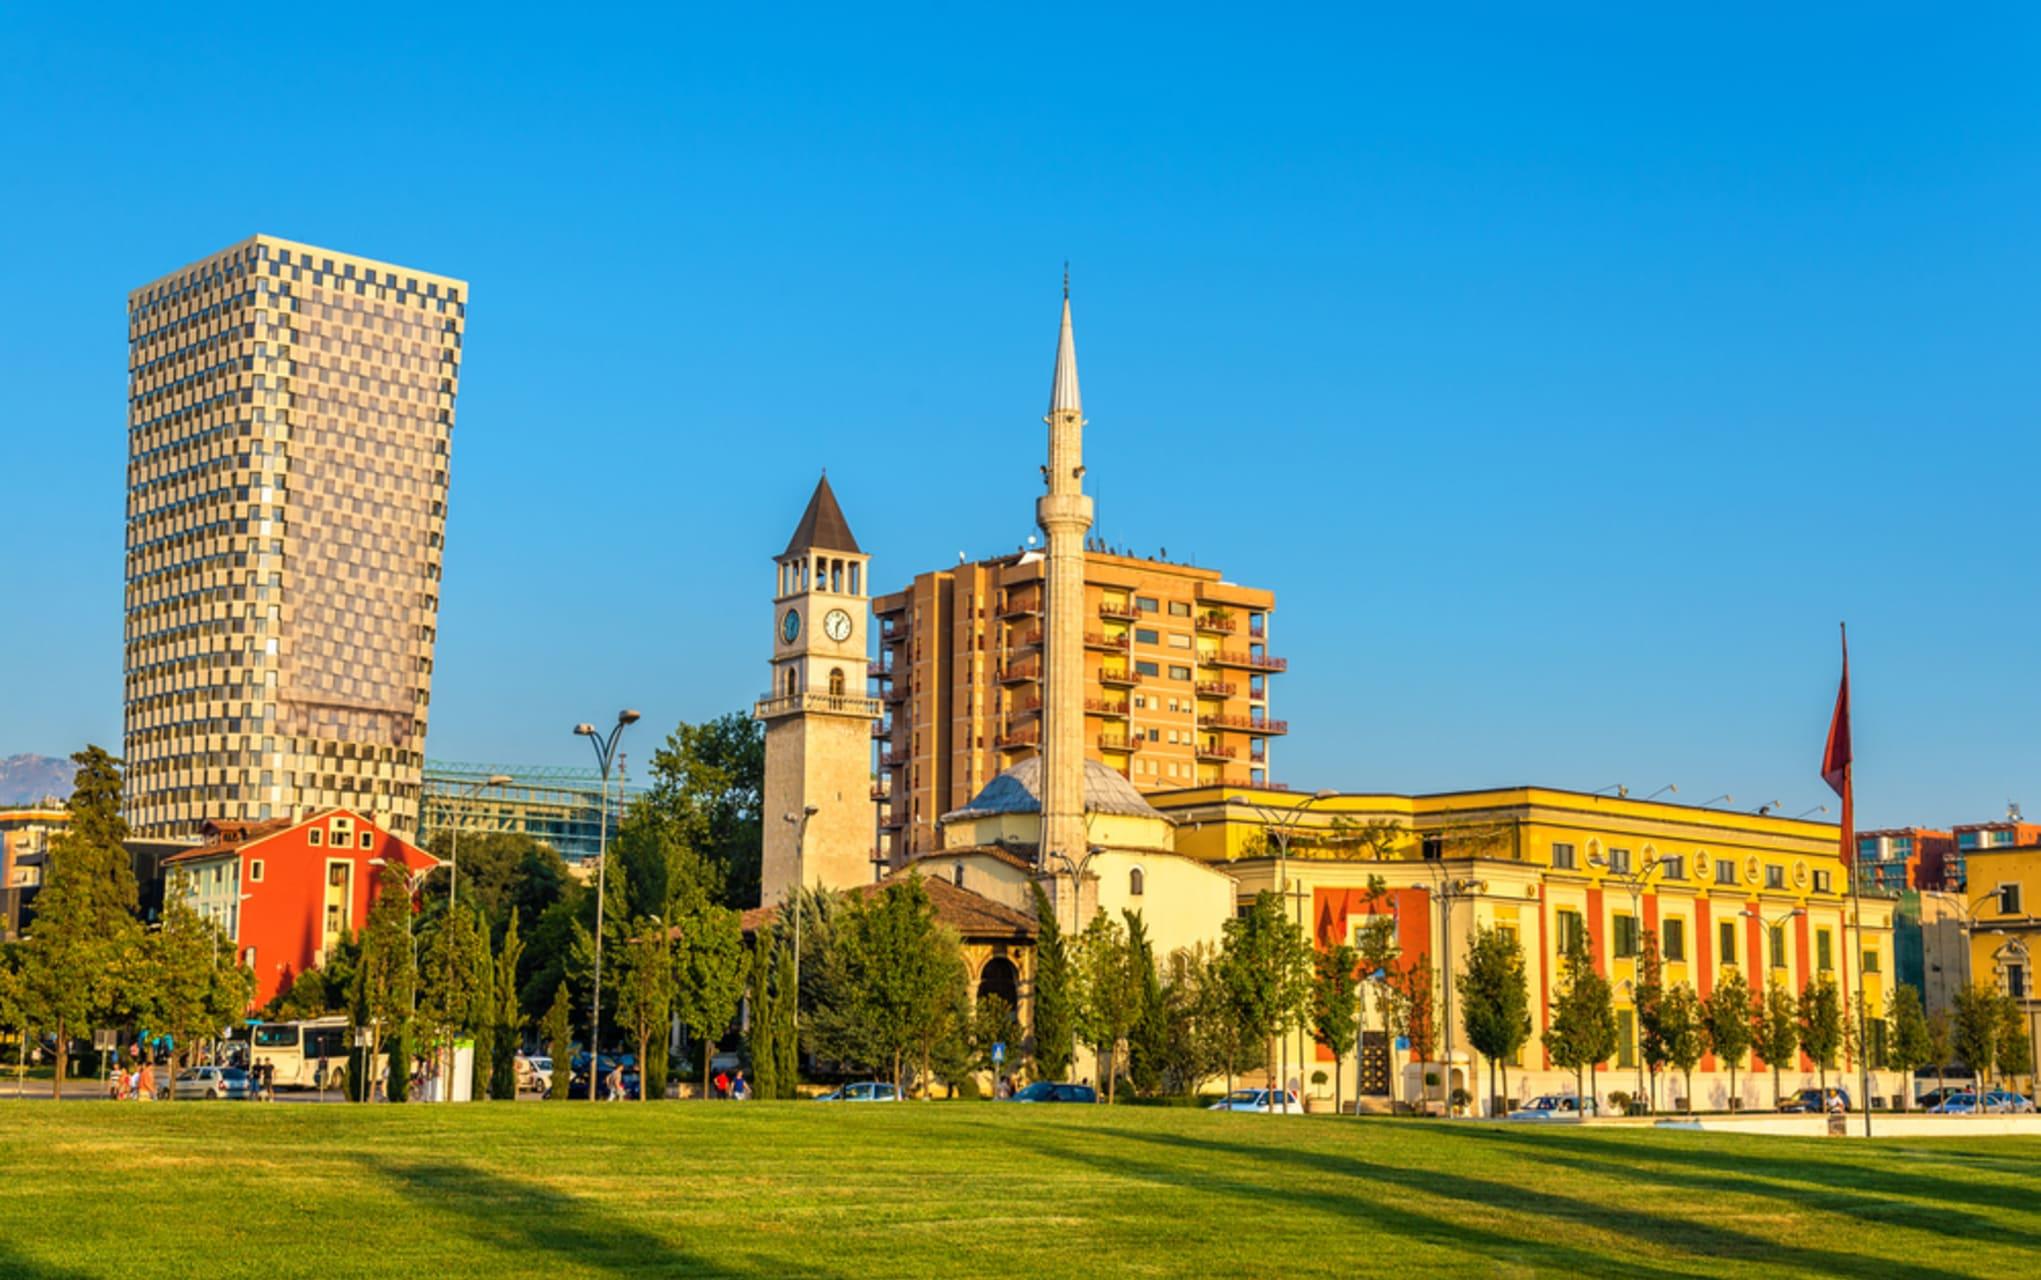 Tirana - Highlights of Tirana, City Tour